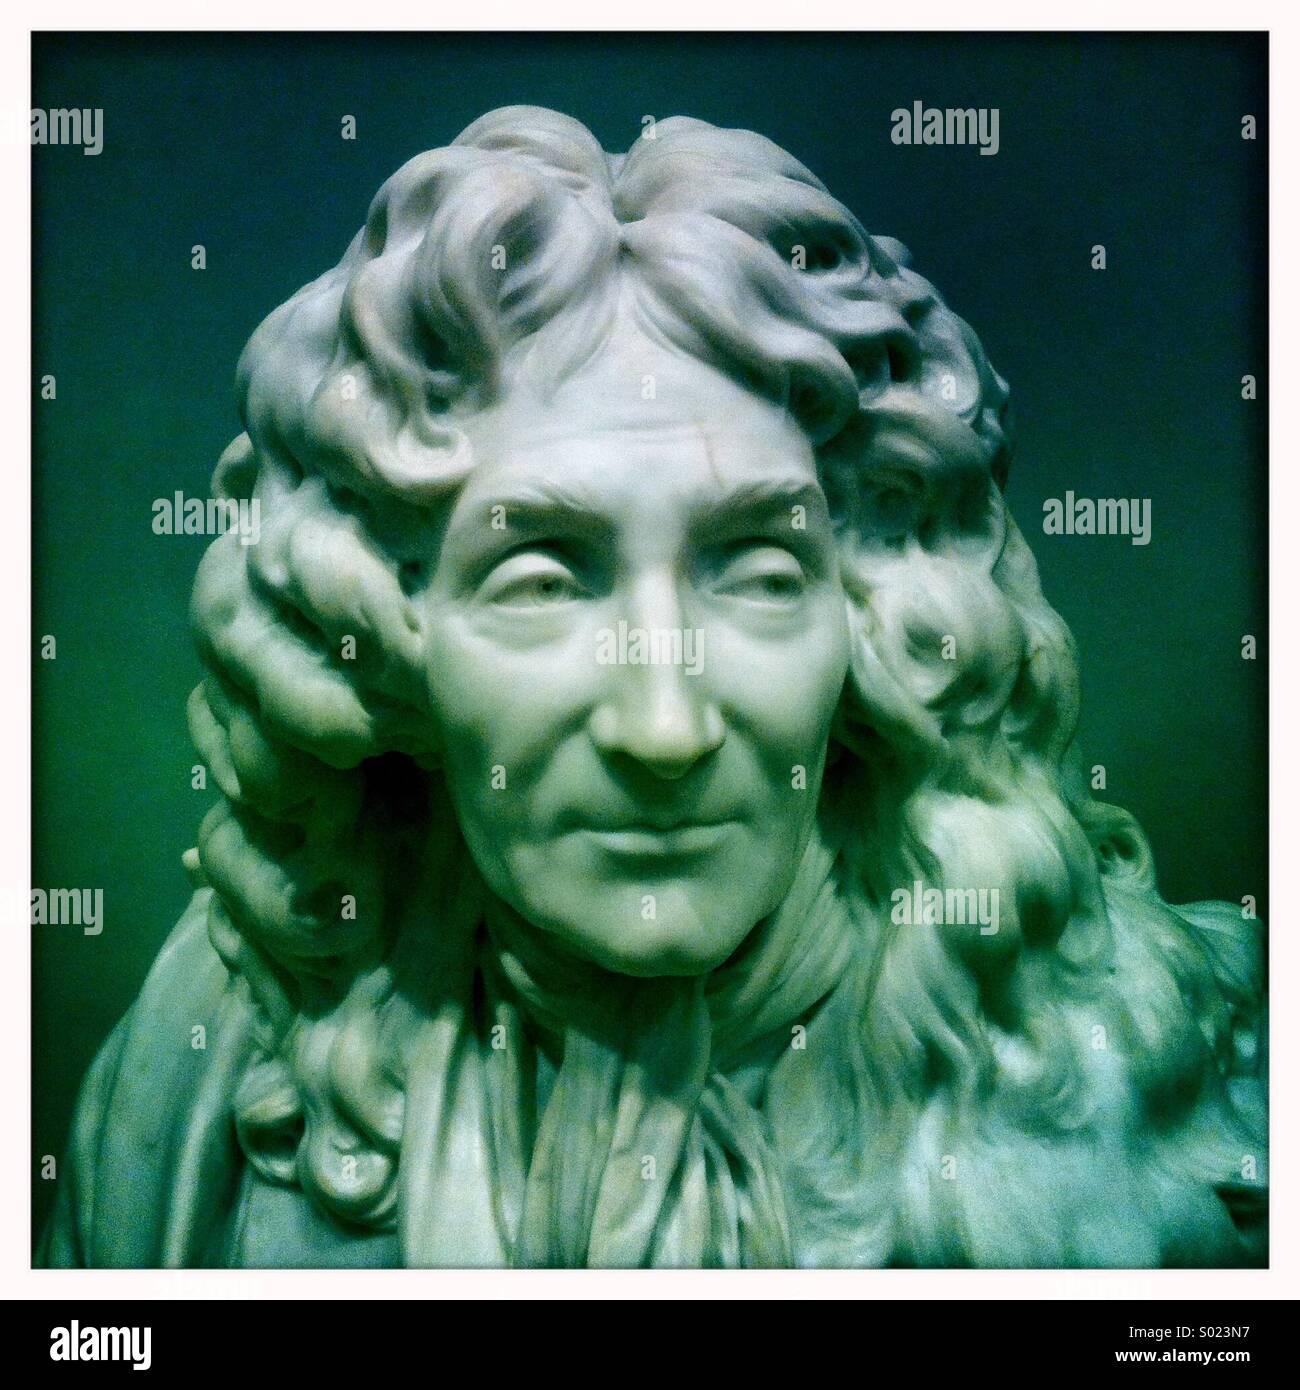 Marmorstatue eines Mannes. Stockbild